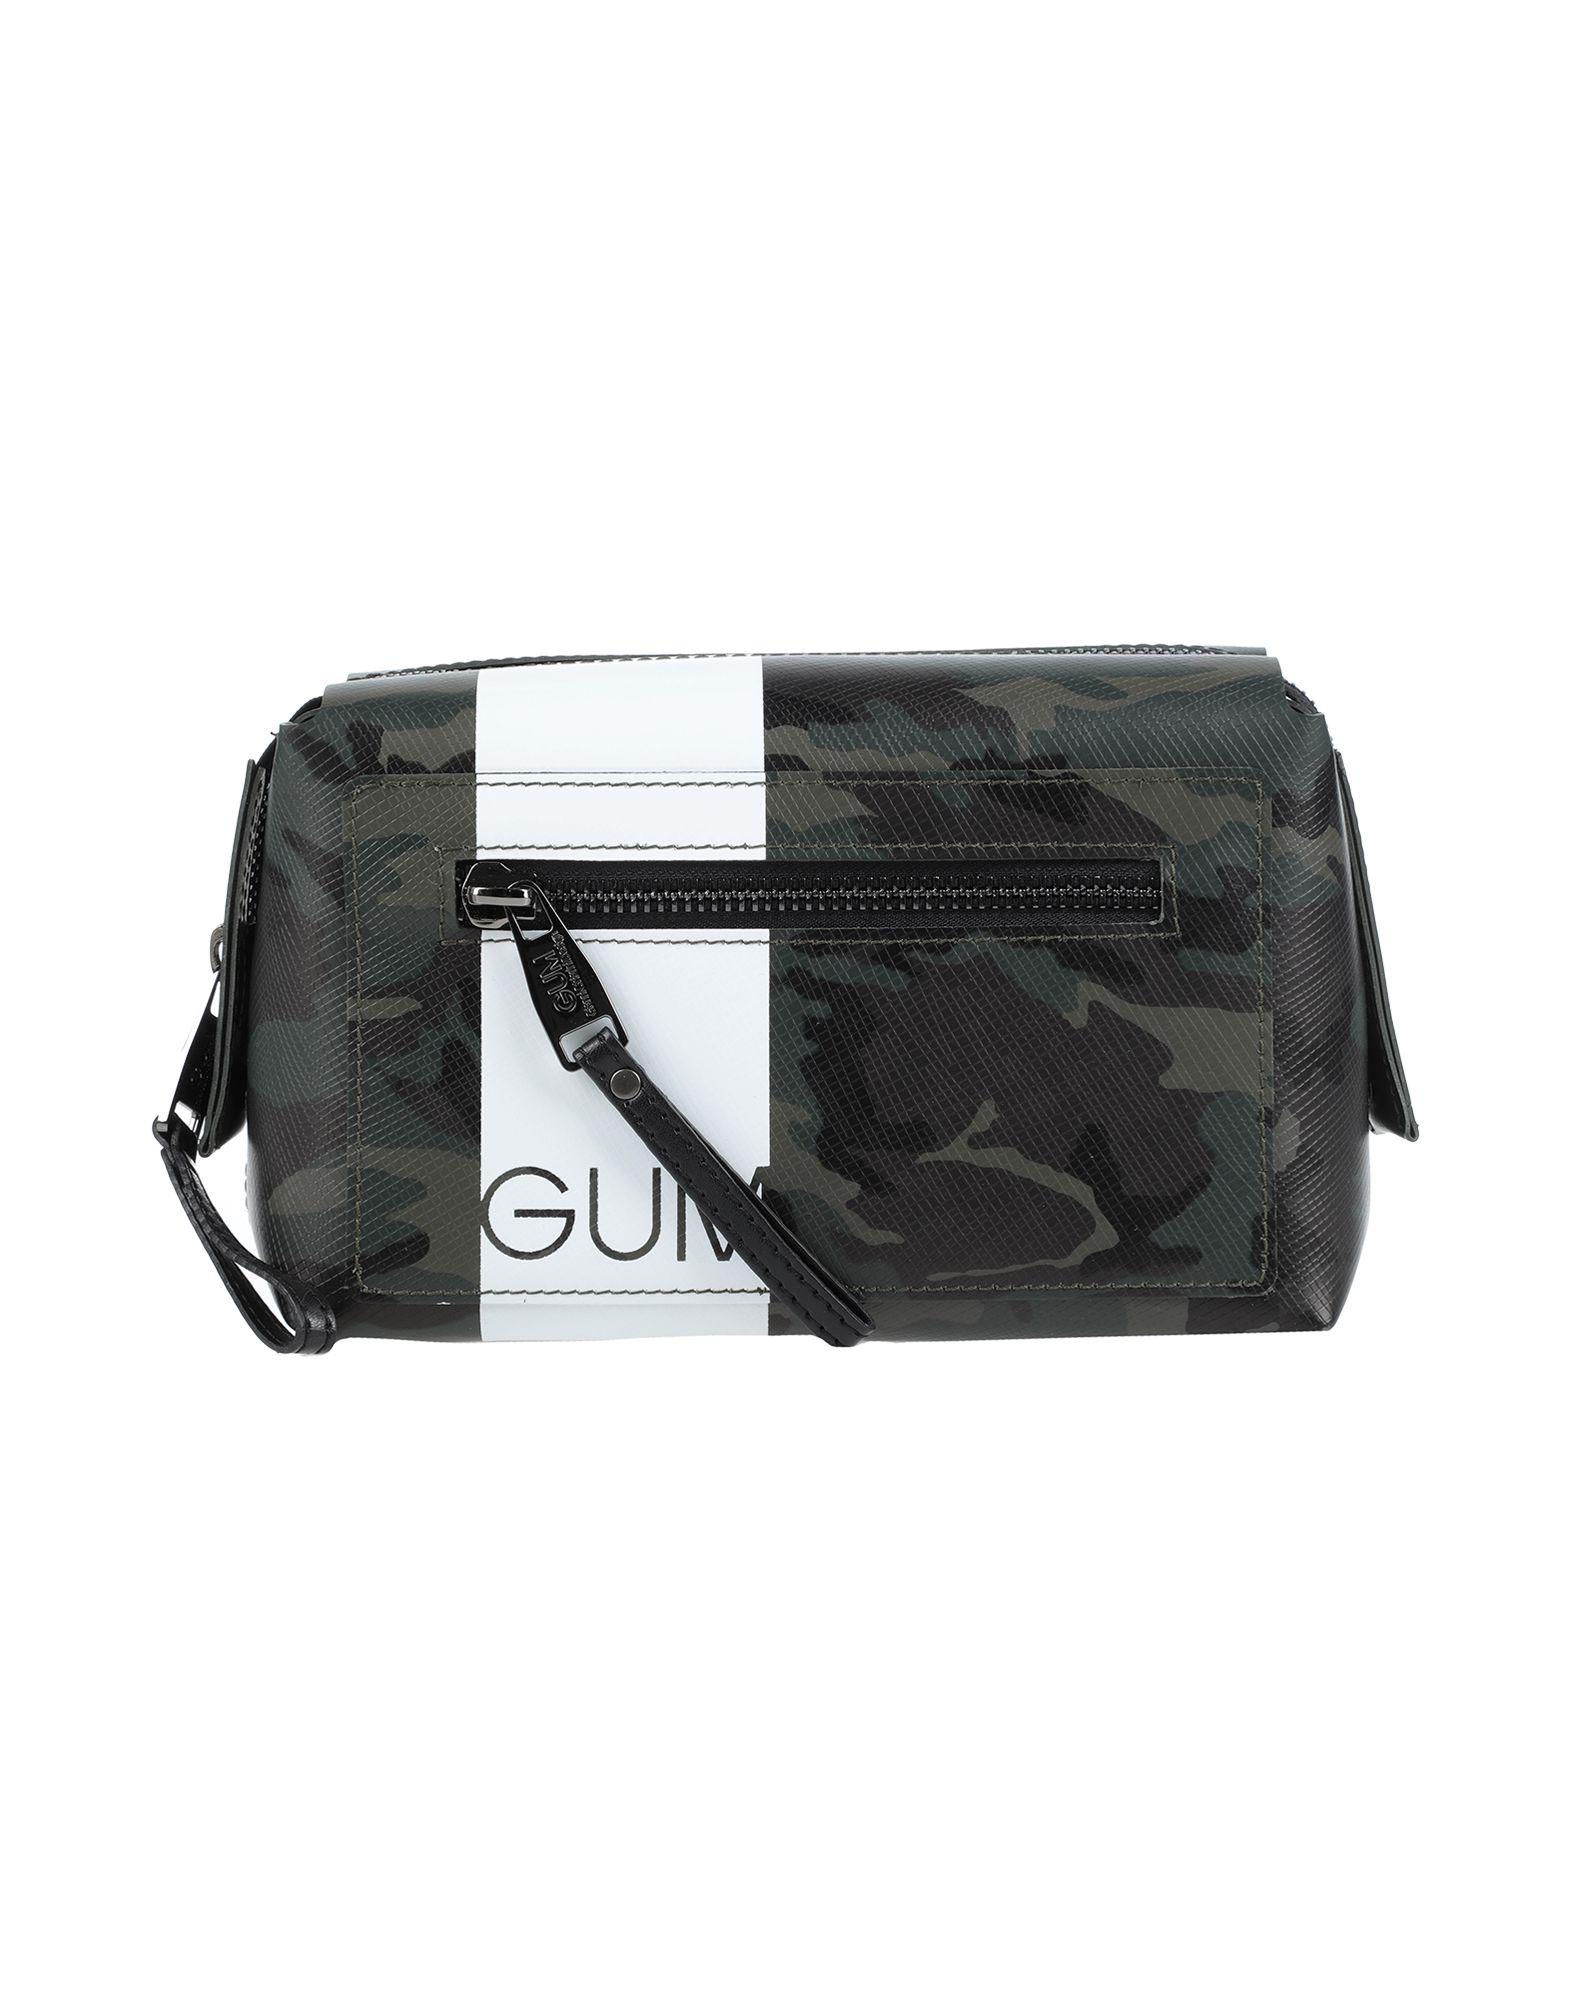 GUM BY GIANNI CHIARINI Beauty case рюкзак gianni chiarini zn 9230 18pe ind marble